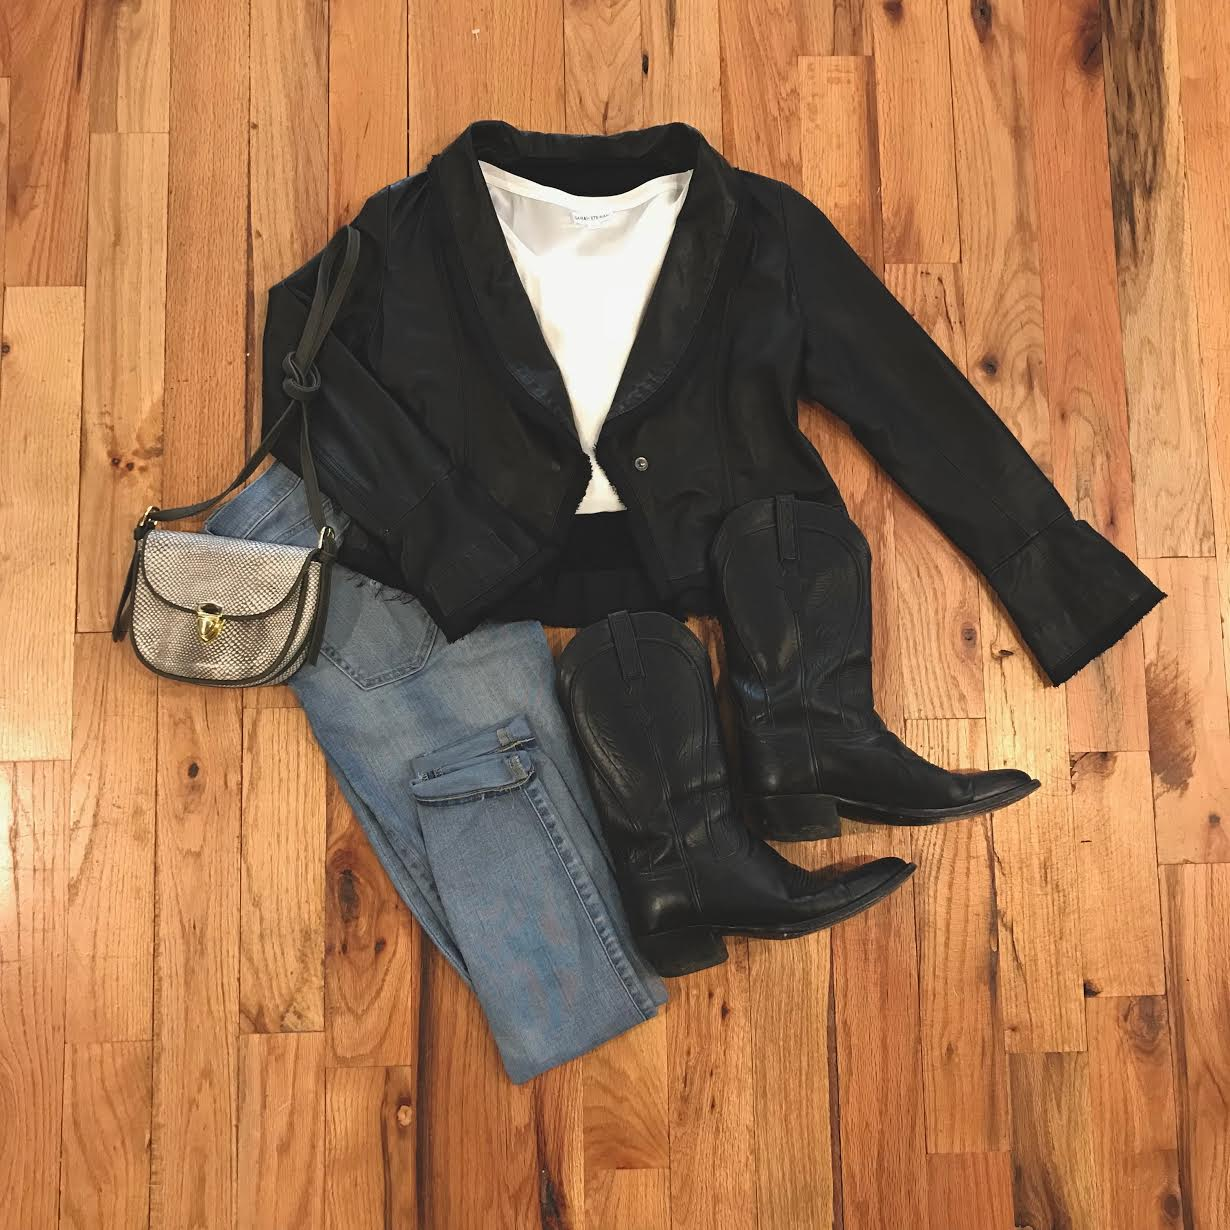 Jacket + Purse